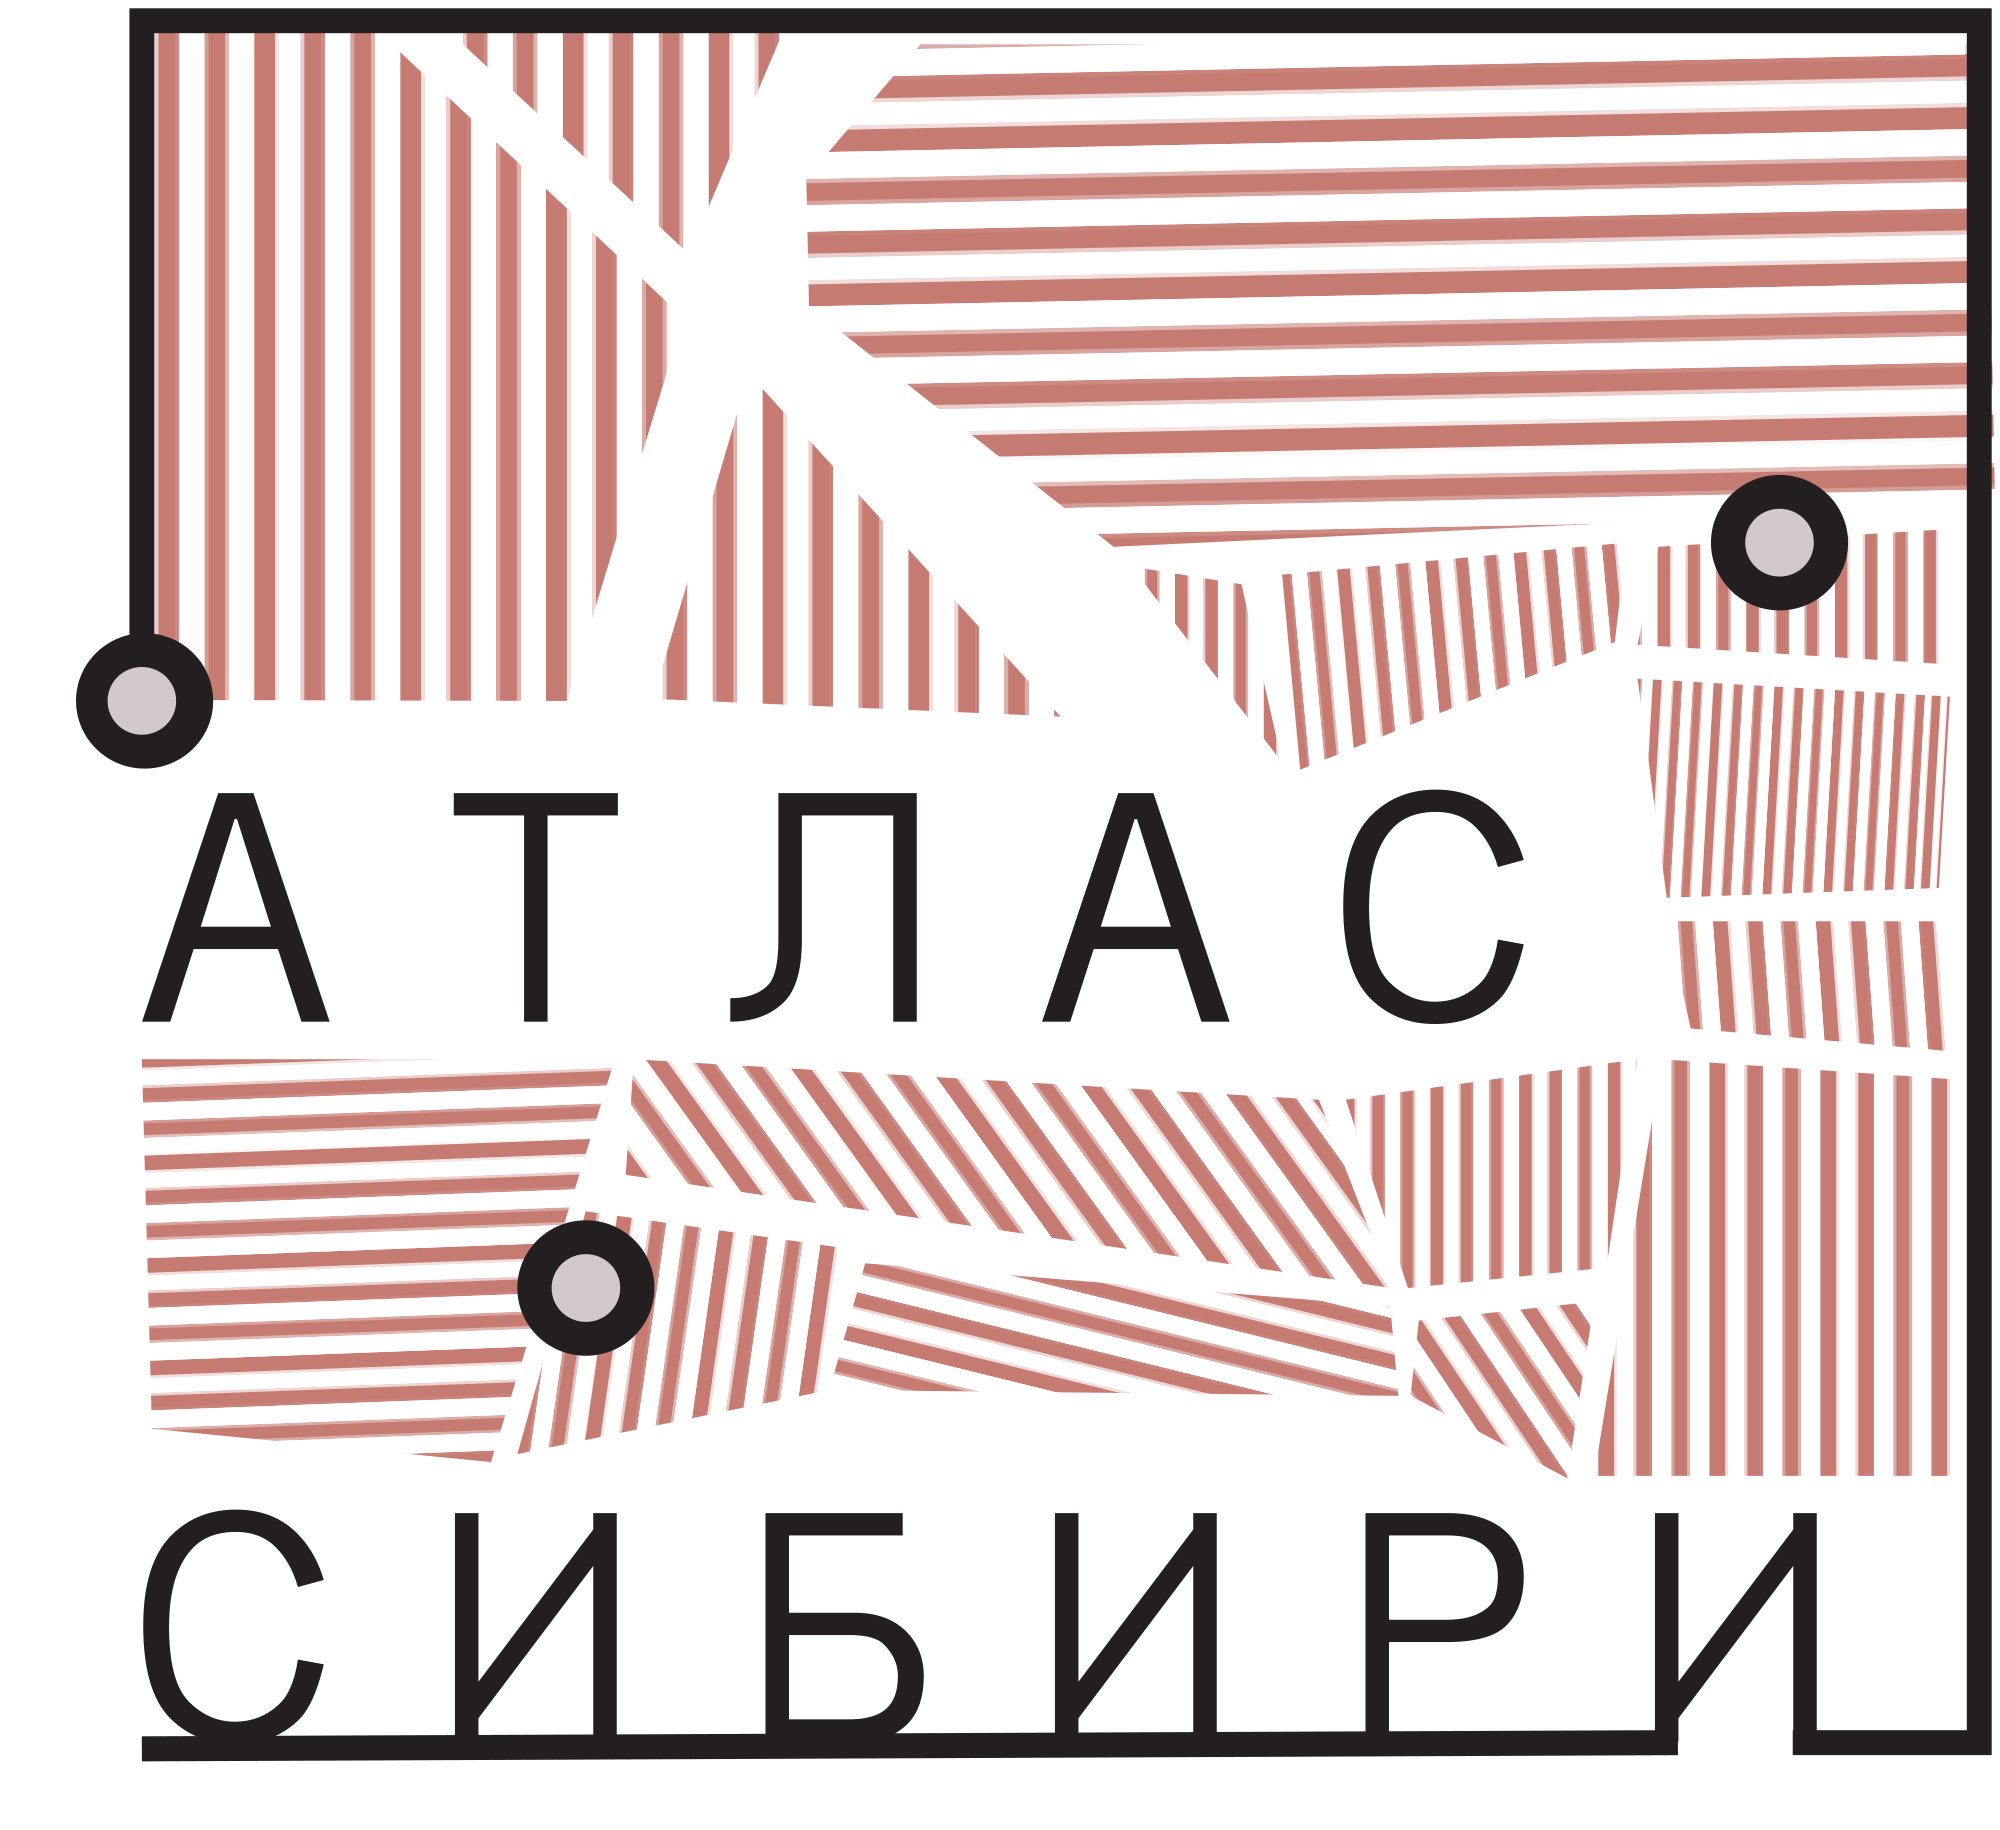 Разработка логотипа Атлас Байкала фото f_8825b018e2b71a2d.jpg